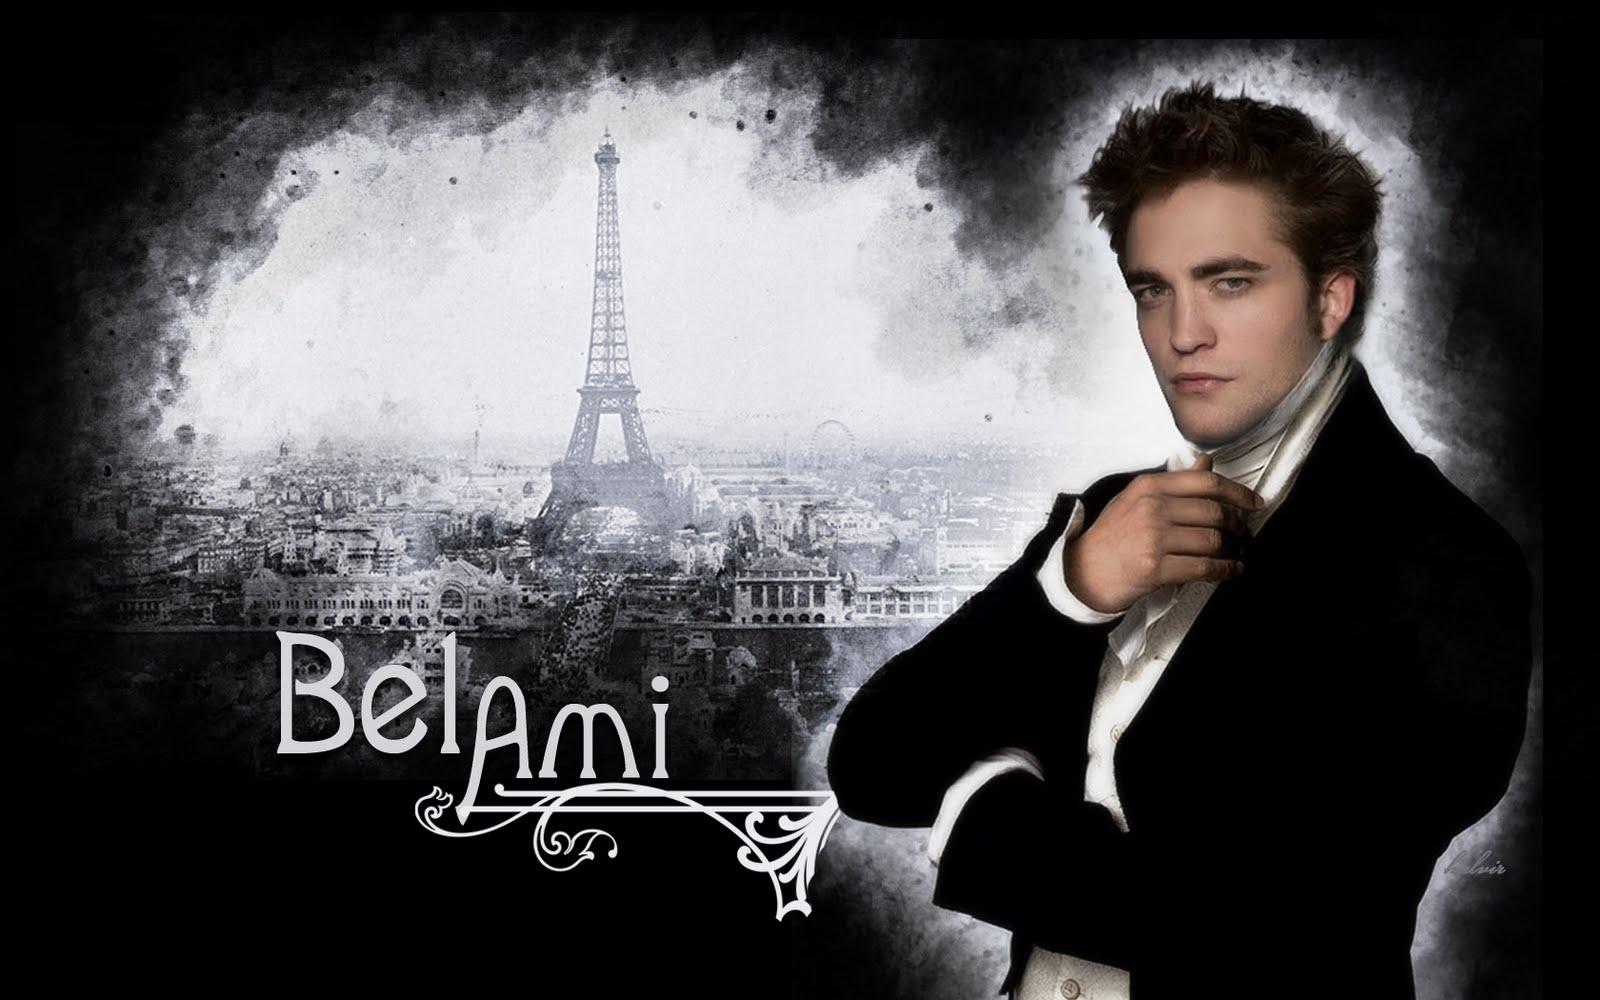 http://3.bp.blogspot.com/-yVOwbMDSMes/T2Y-v4IggMI/AAAAAAAAEr0/06YlJG3nKx8/s1600/Robert-Pattinson-BEL-AMI-nosologeeks.jpg